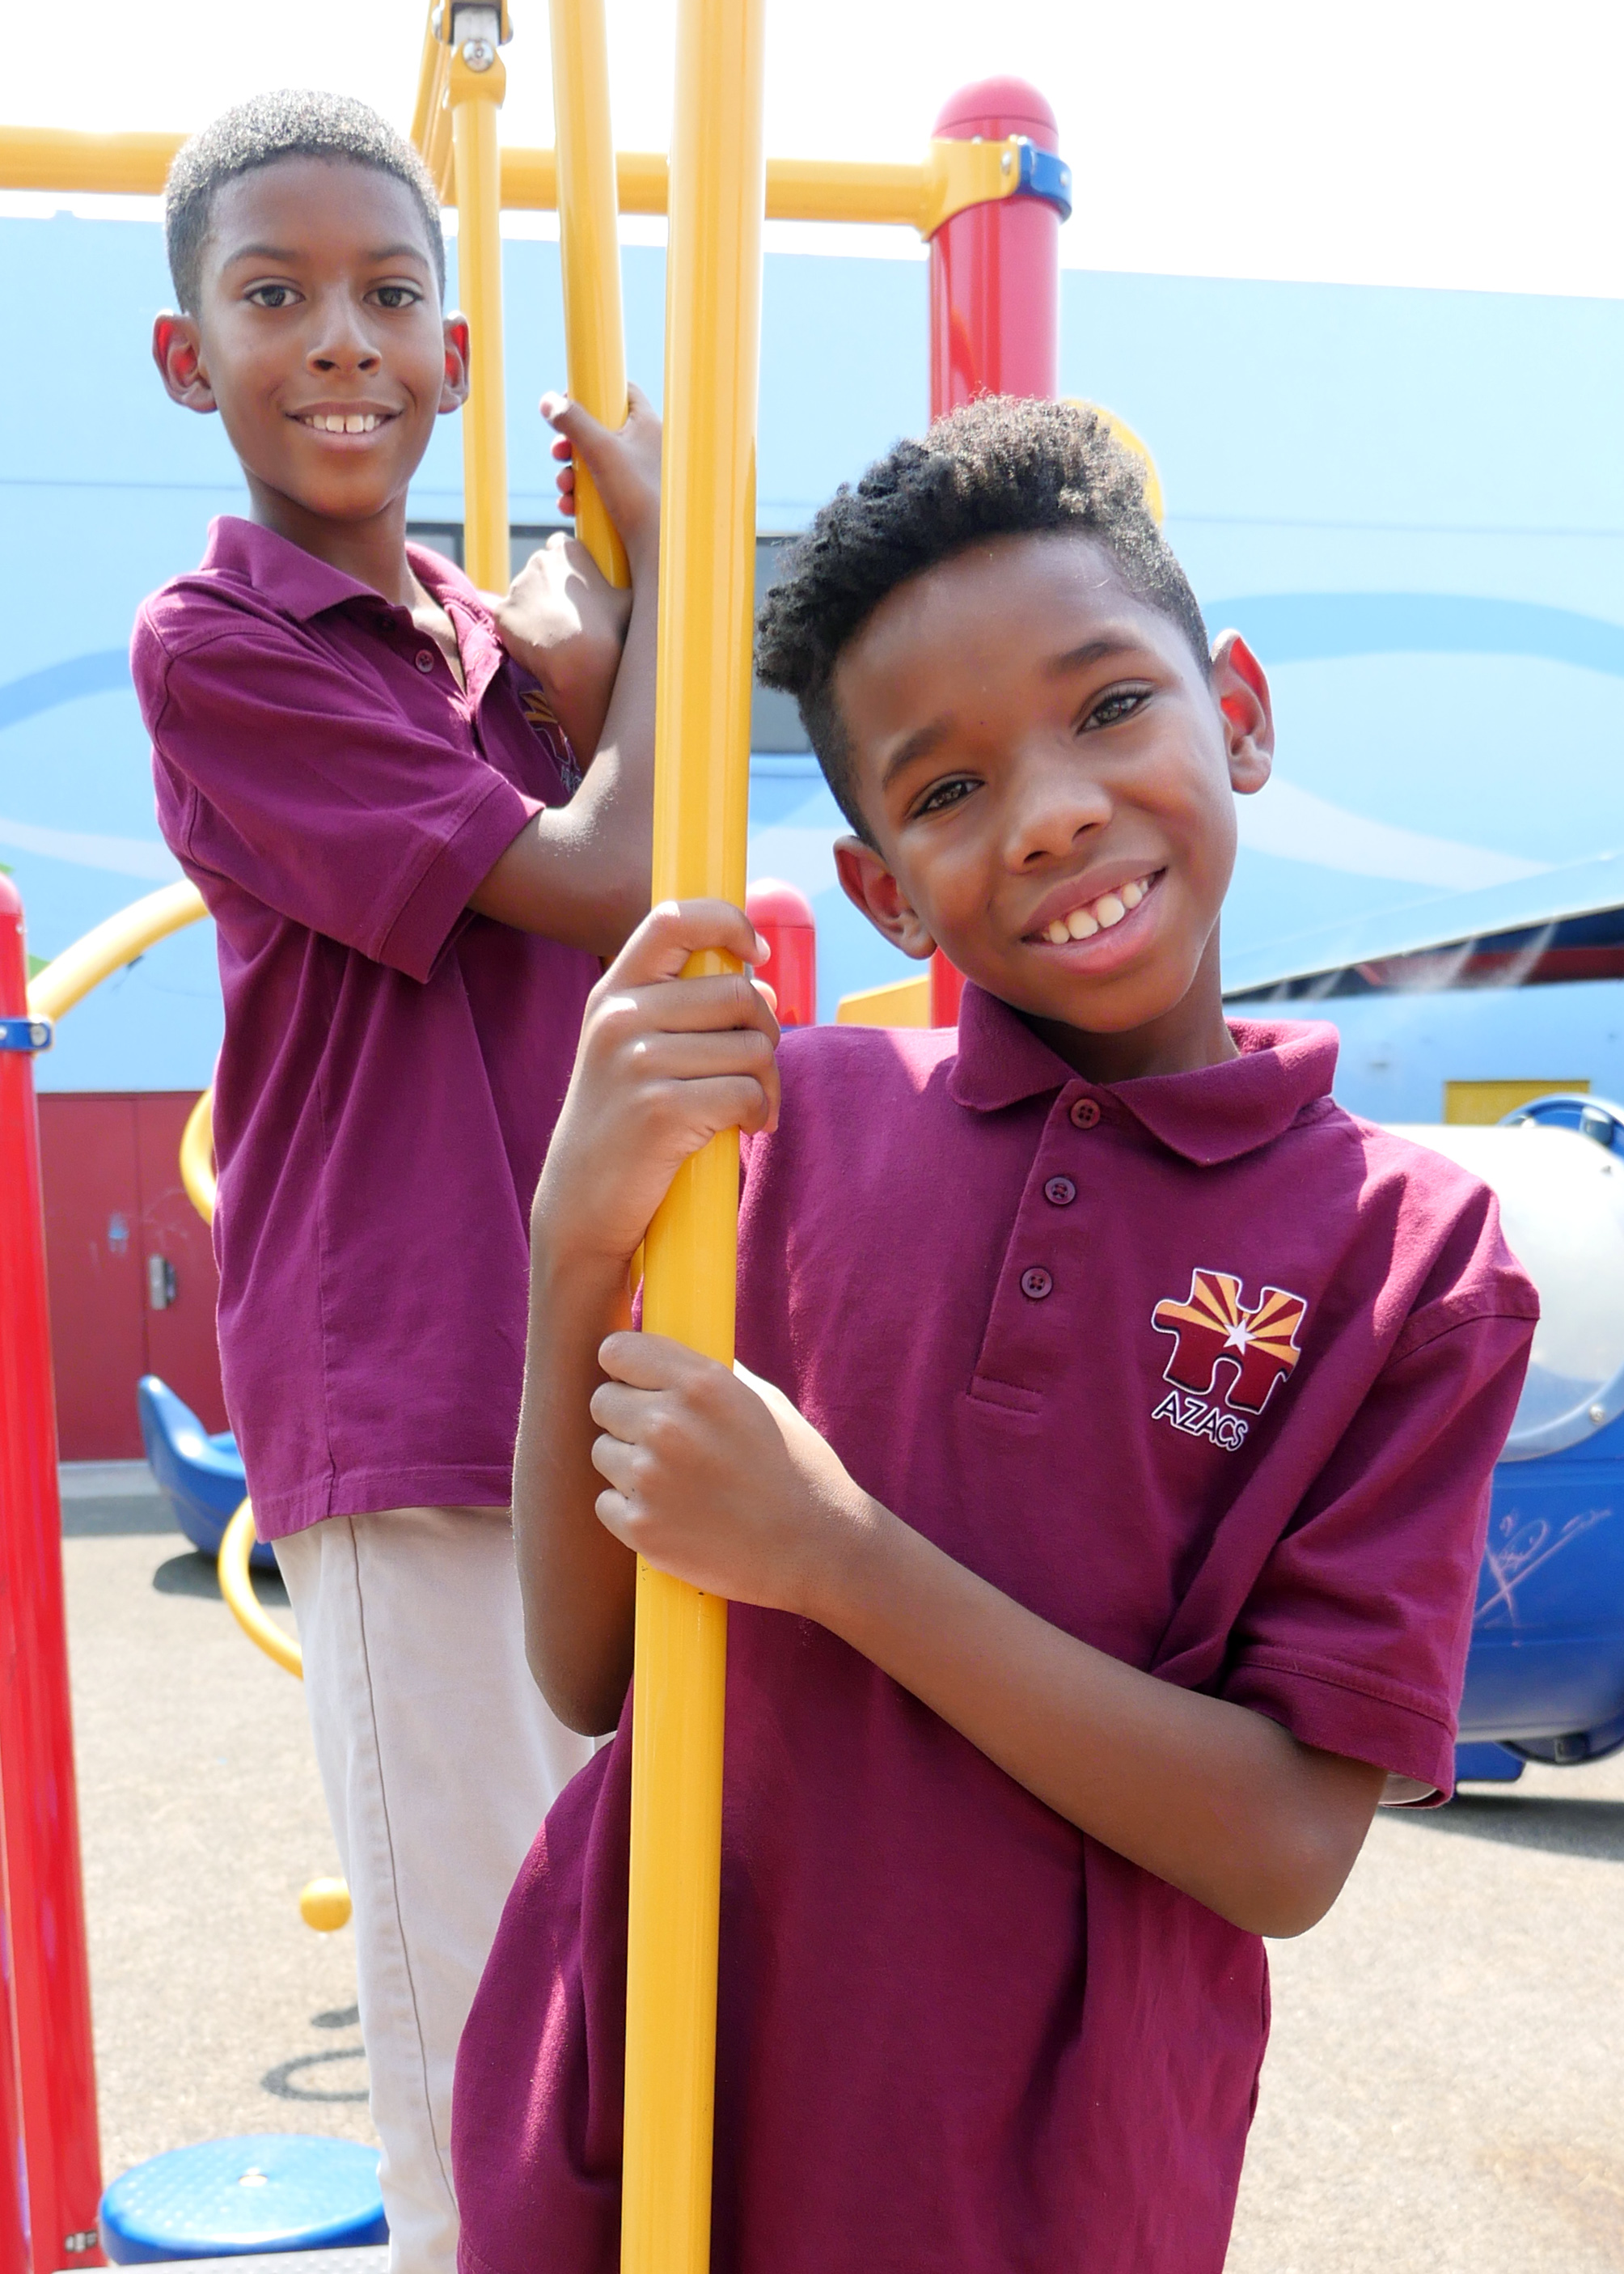 Playground 6 – AZACS Elementary School – Campus Photos Fall 2017 –Christie Lukes Photography.jpg